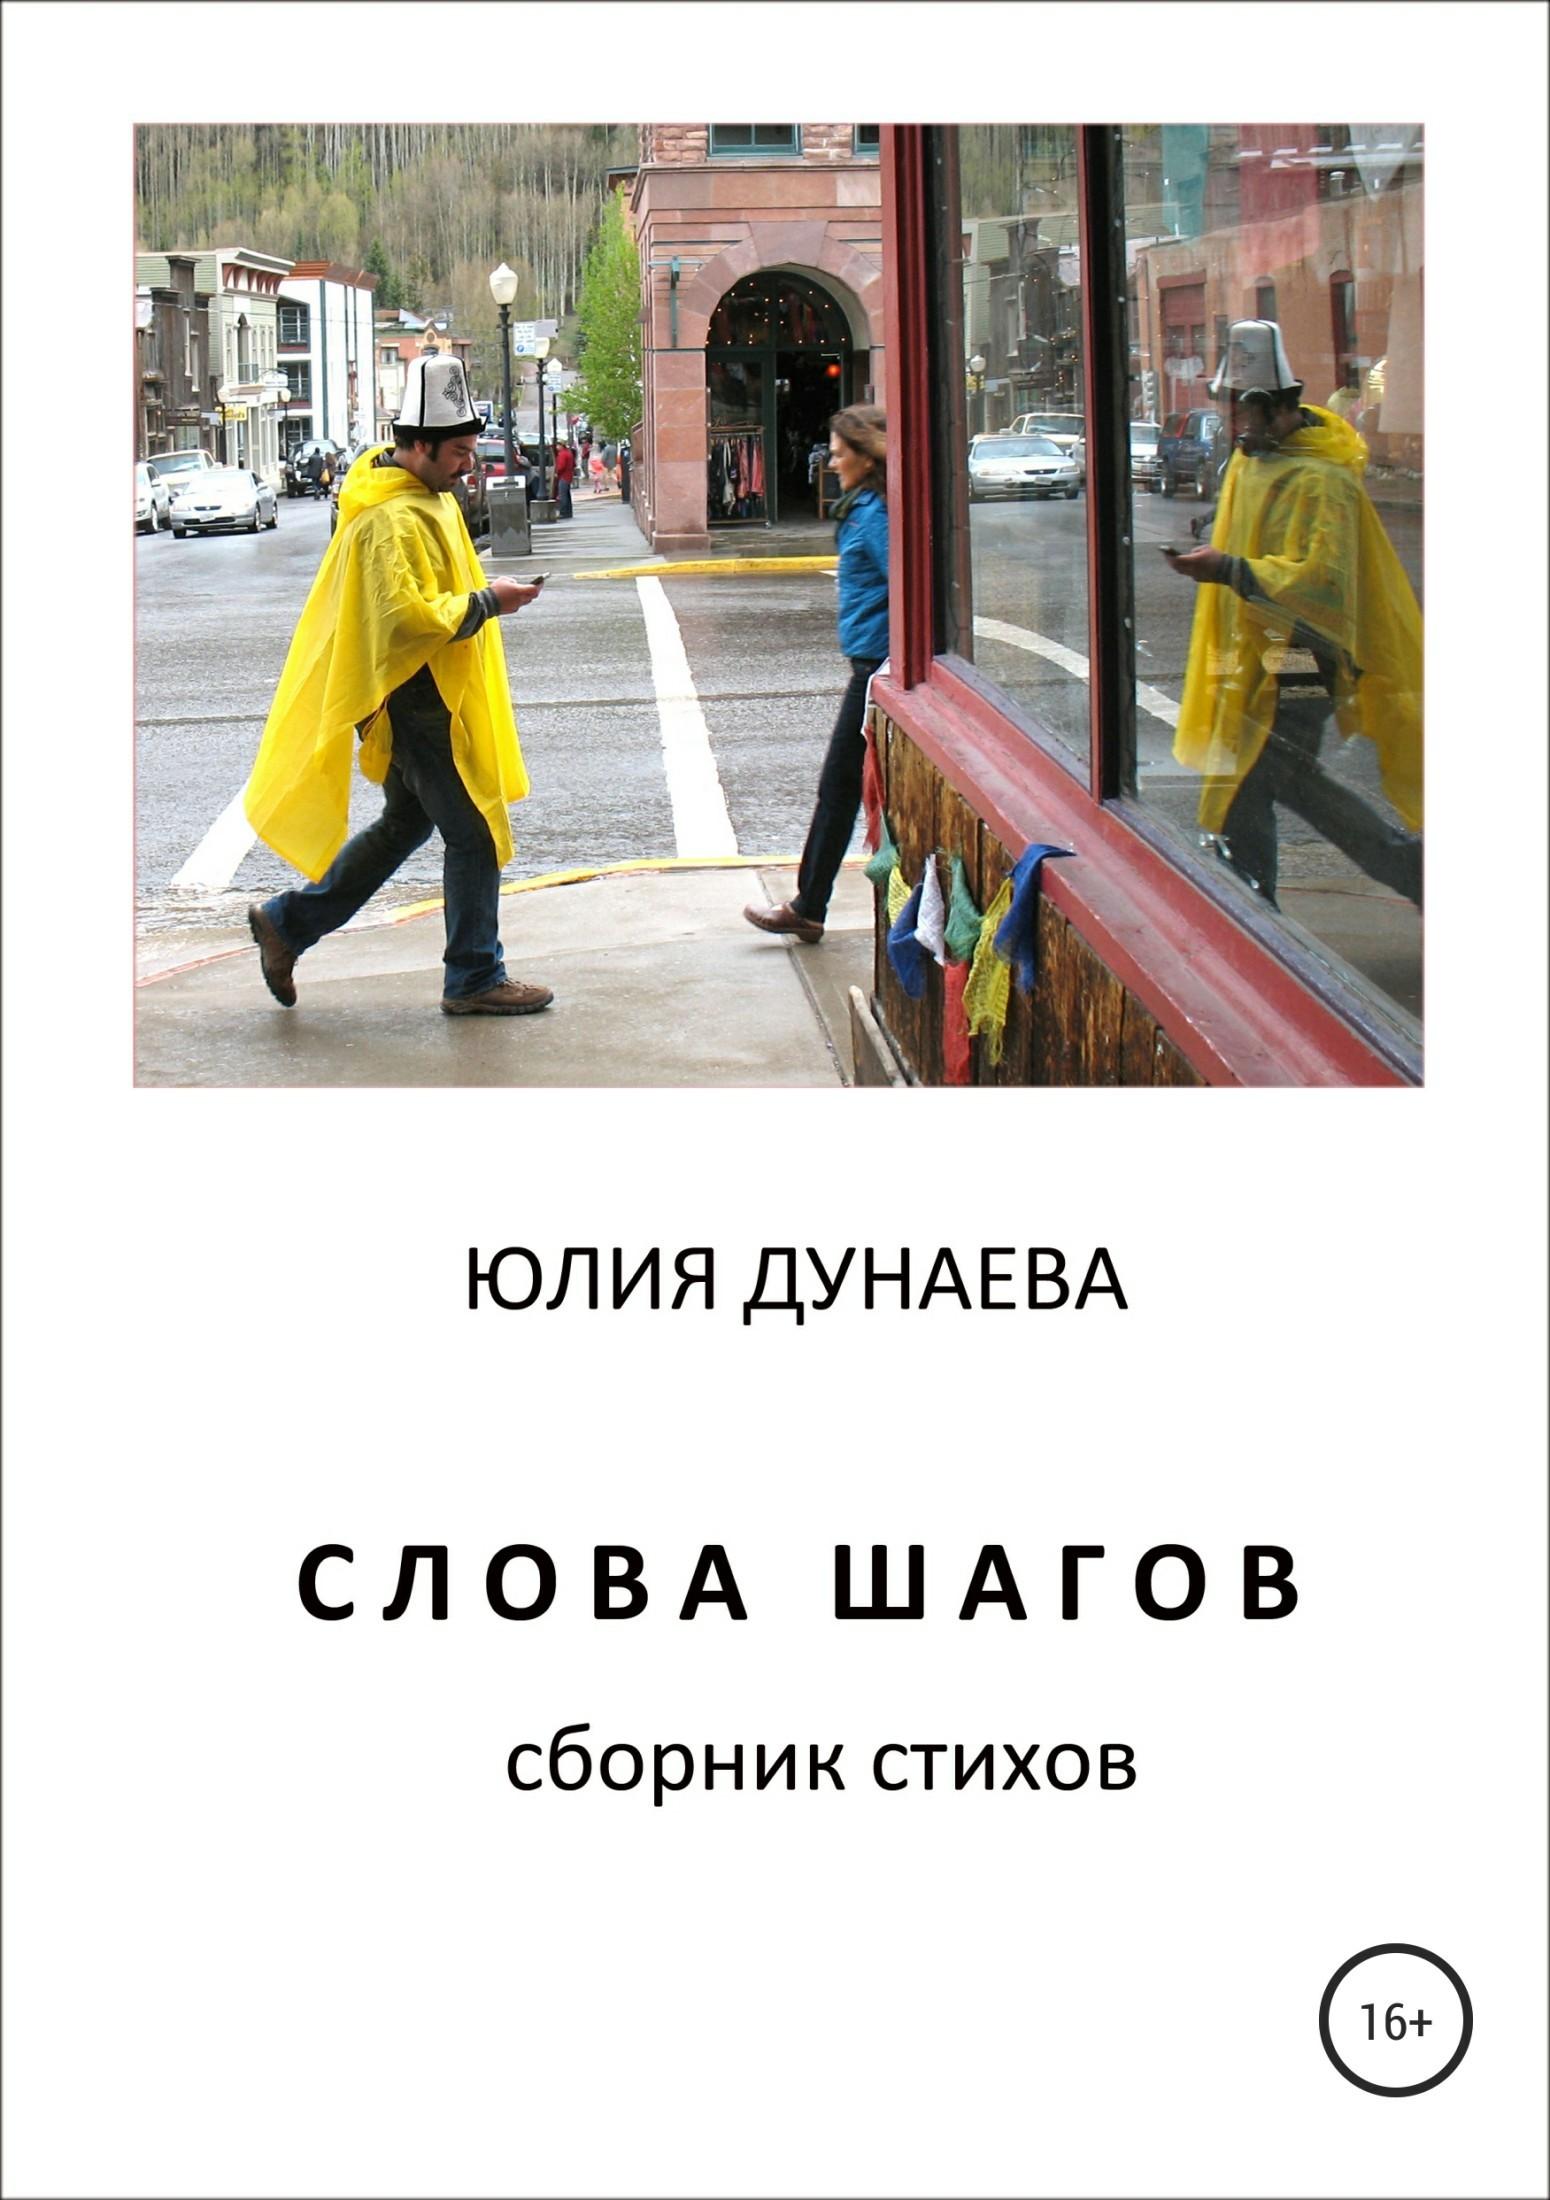 Юлия Дунаева Слова шагов. Сборник стихов цена в Москве и Питере